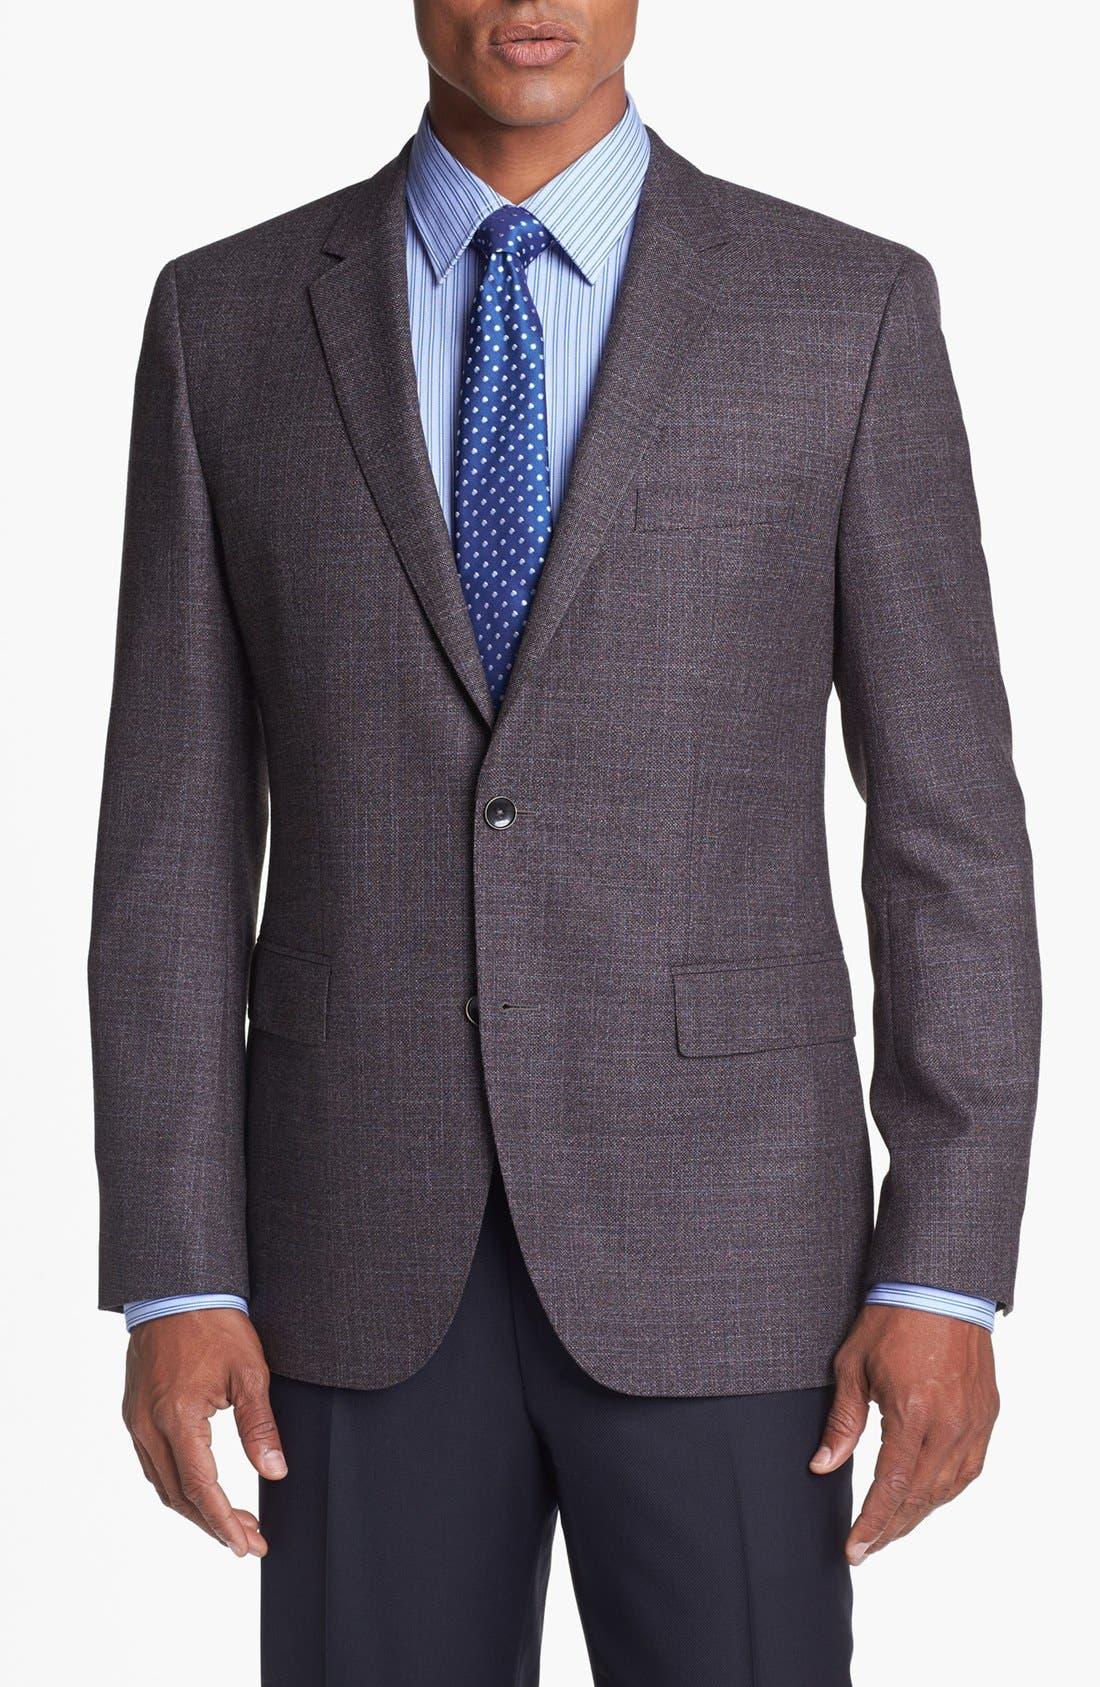 Main Image - BOSS HUGO BOSS 'The Keys' Trim Fit Wool Sportcoat